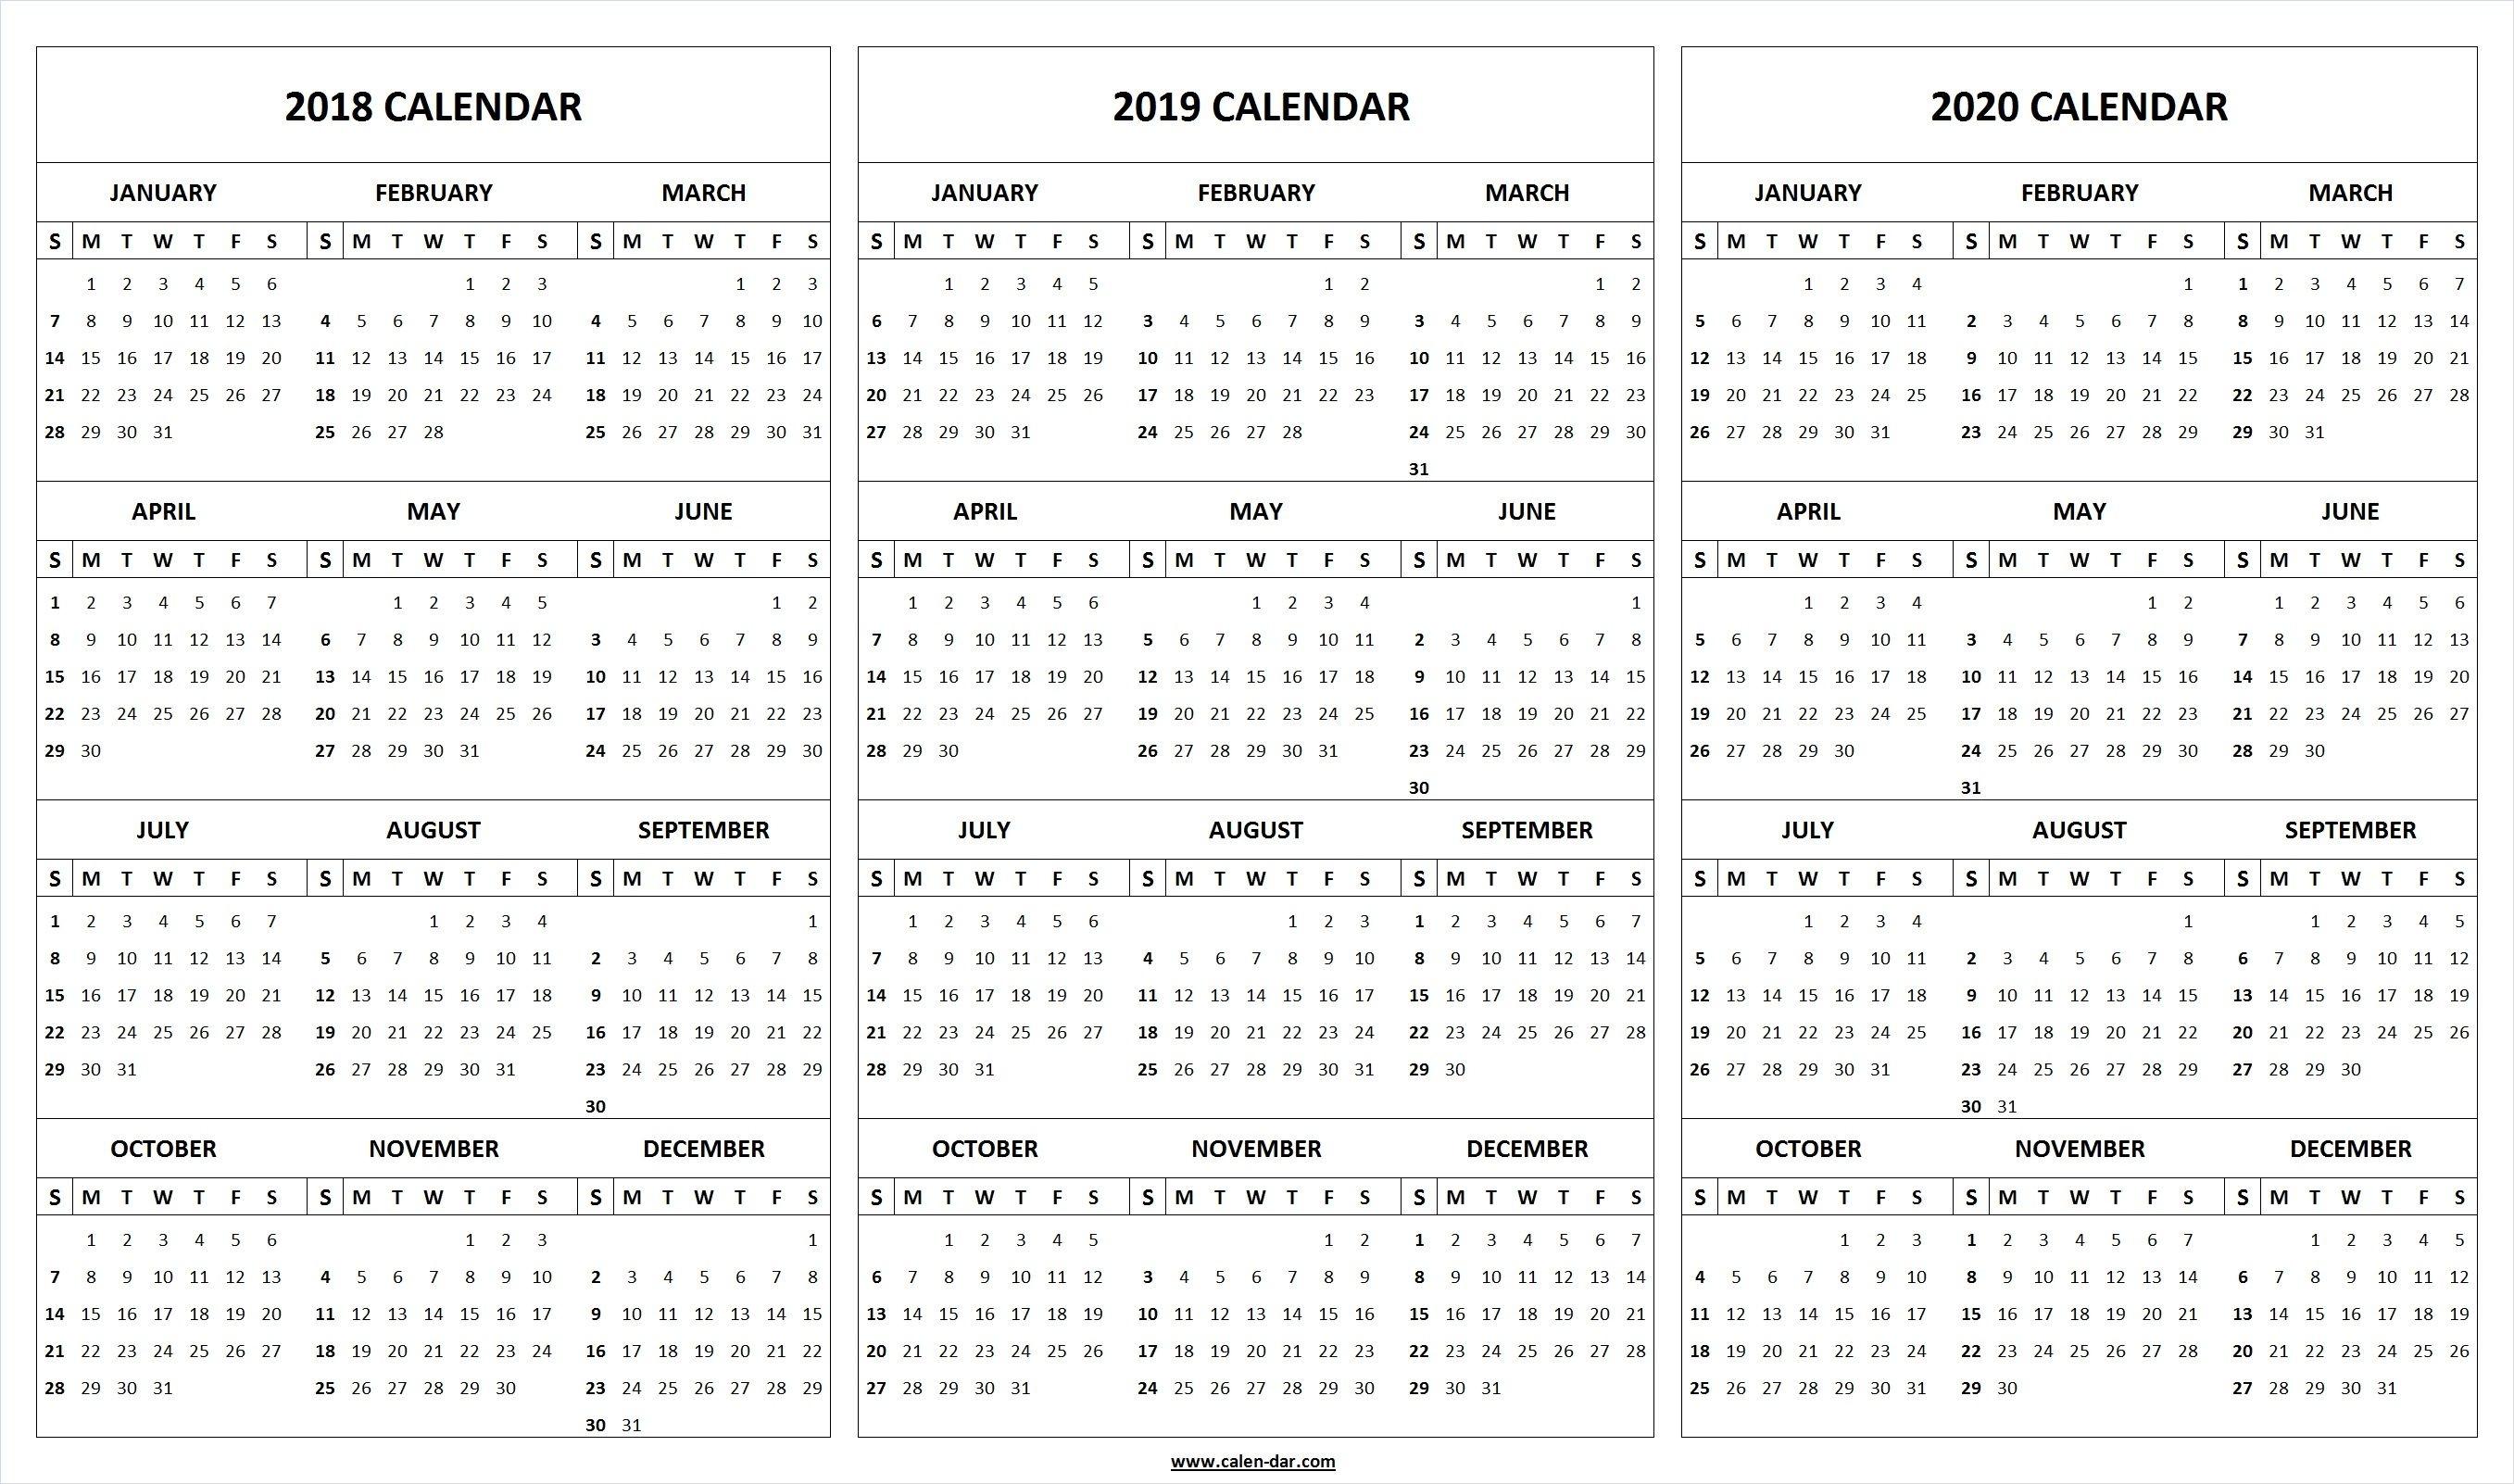 Print Blank 2018 2019 2020 Calendar Template | Organize! | Printable pertaining to Free Printable 2020 Calendar With Space To Write